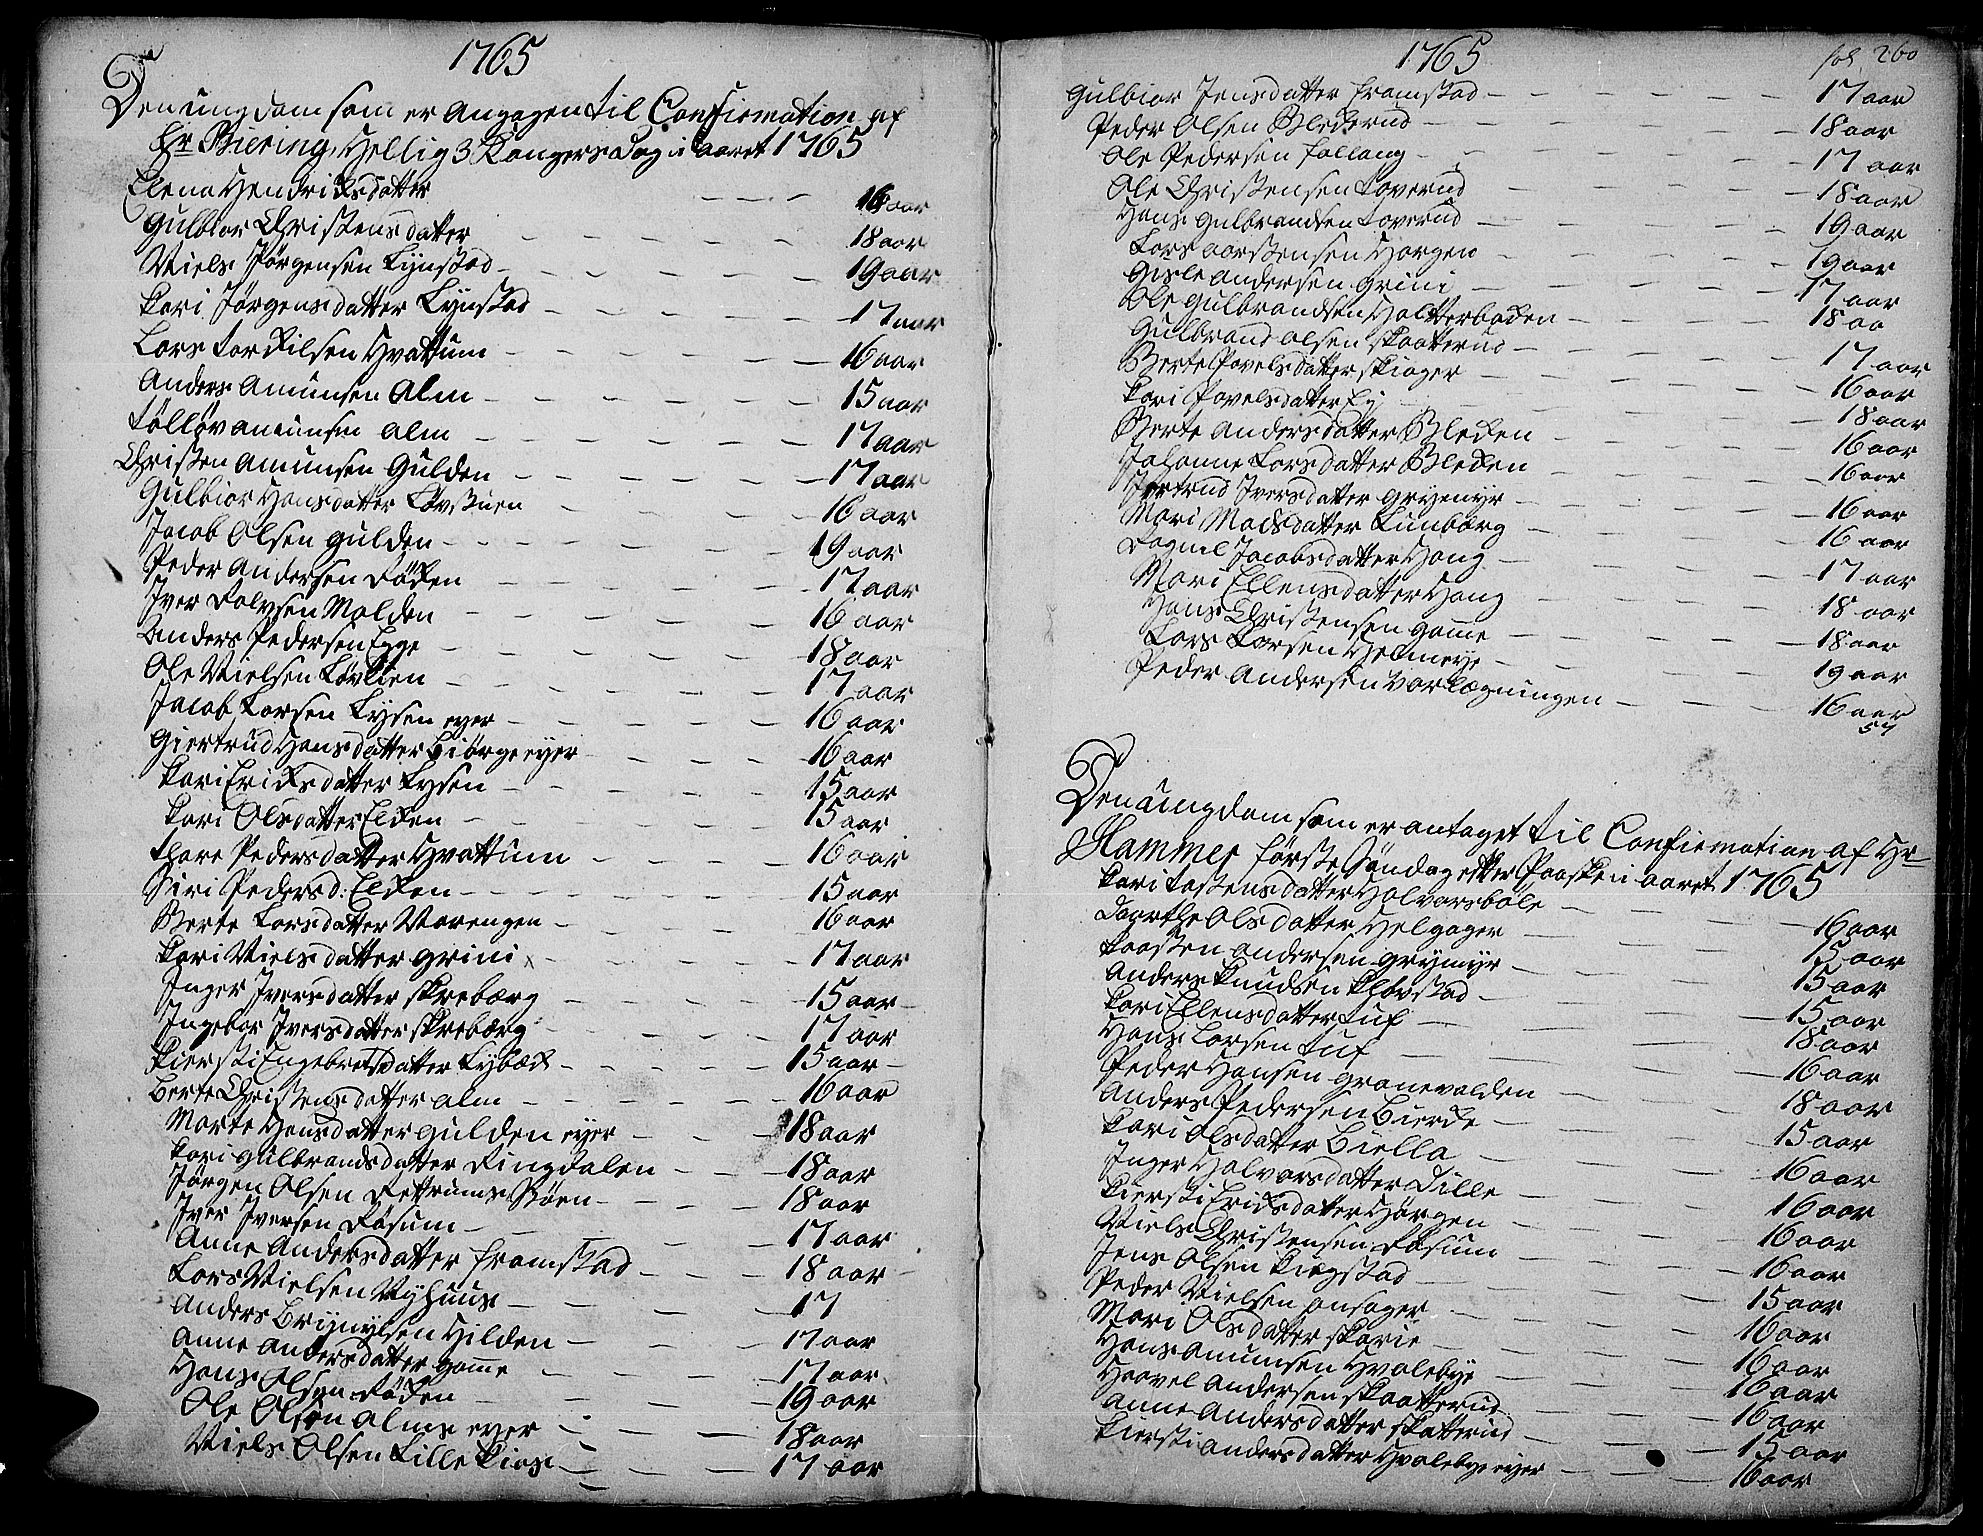 SAH, Gran prestekontor, Ministerialbok nr. 4, 1759-1775, s. 260